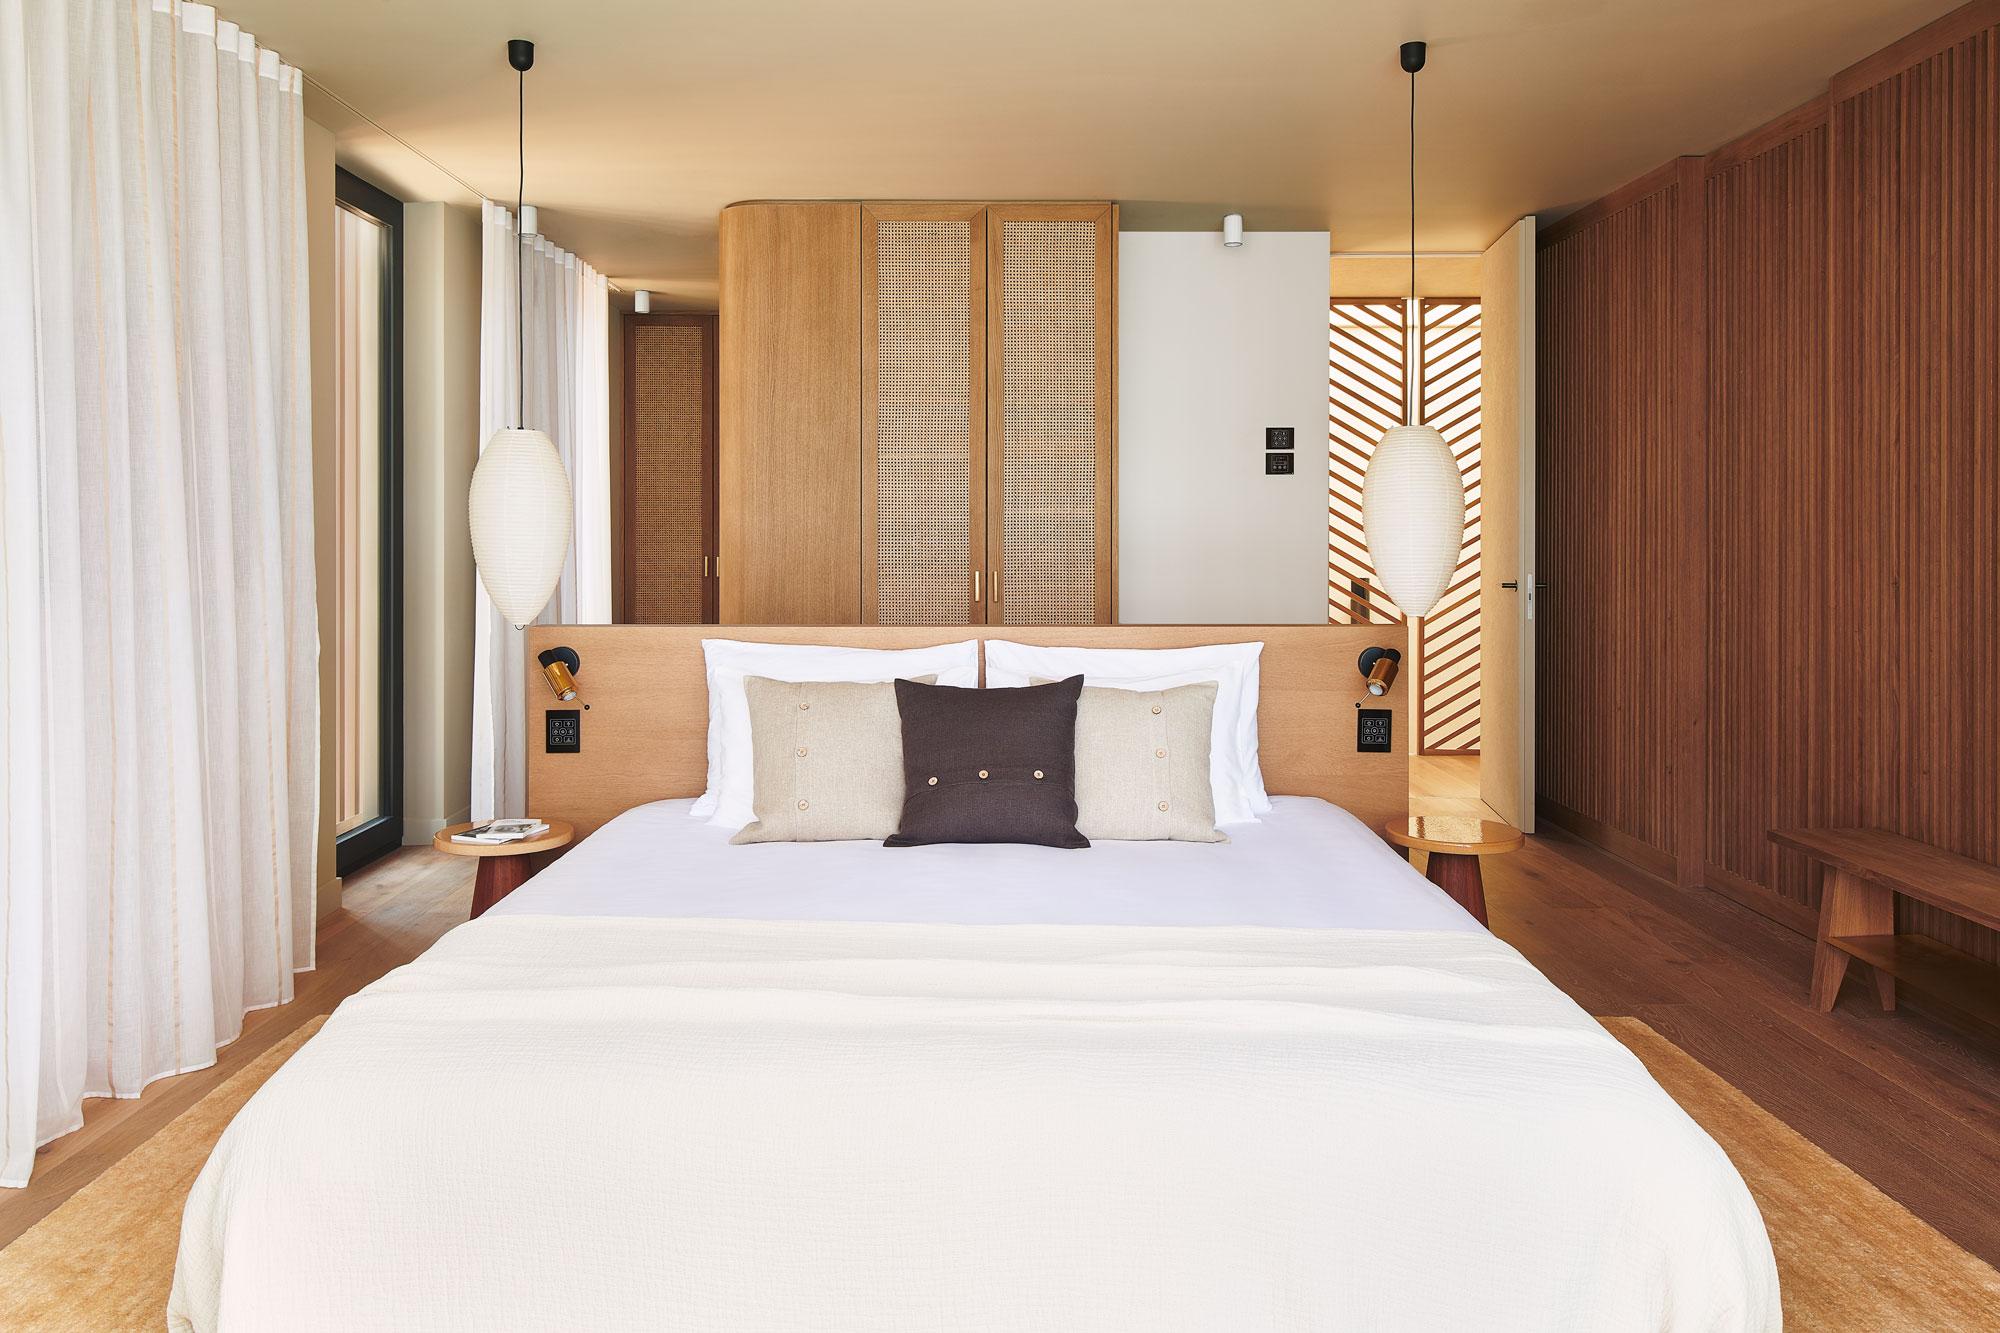 Lam Studio Hotel Maslina Hvar Croatia Luxury Accommodatino Photo Claire Israel Yellowtrace 17